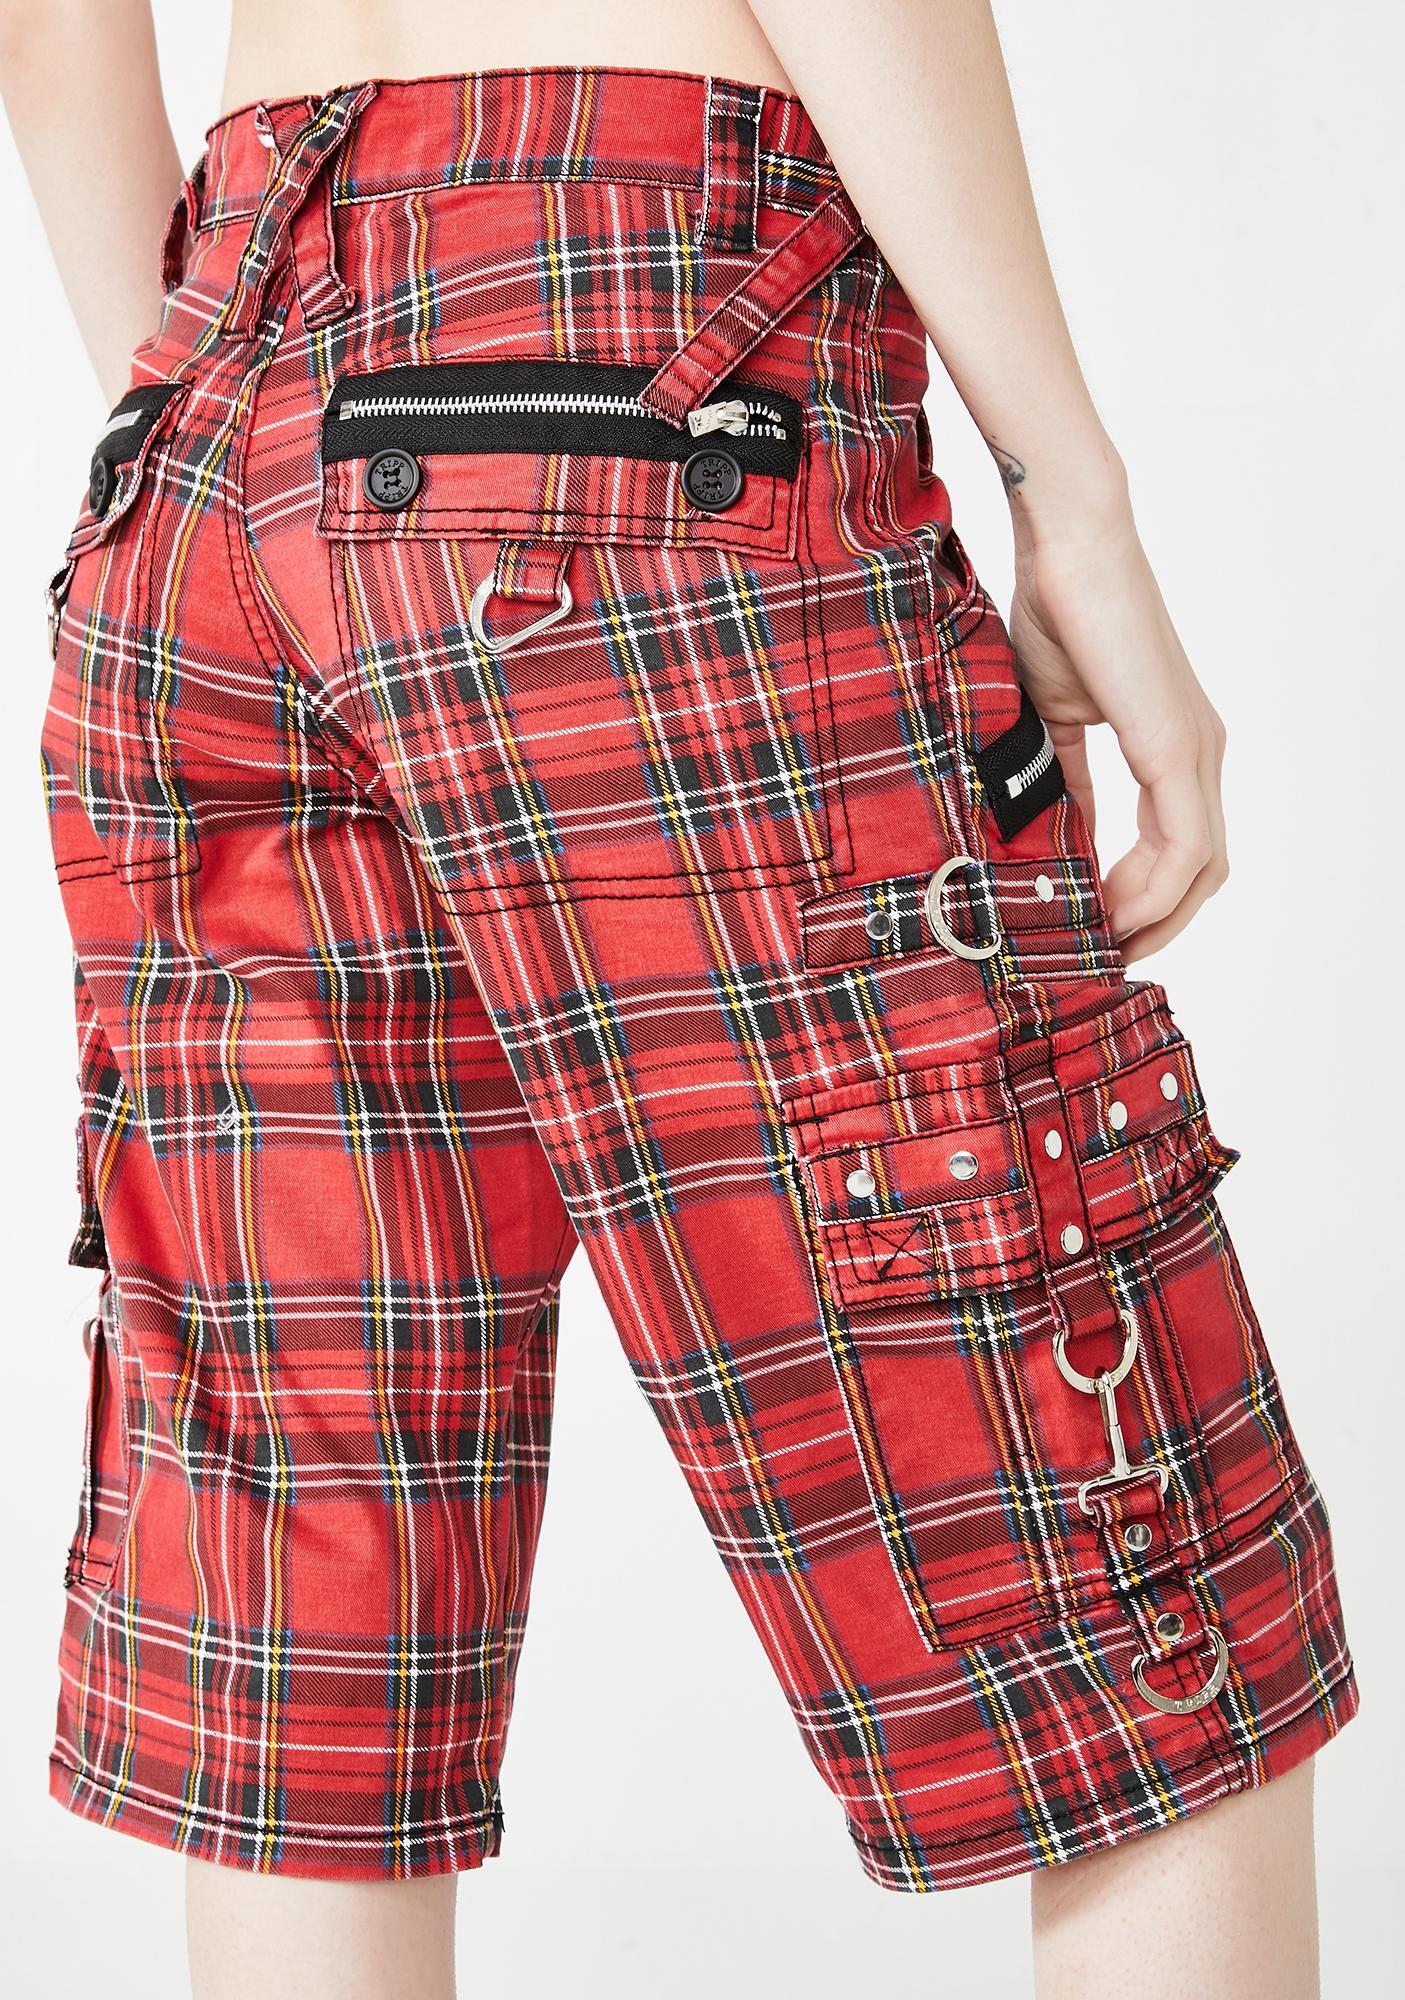 Tripp NYC Plaid Punk Rock Shorts